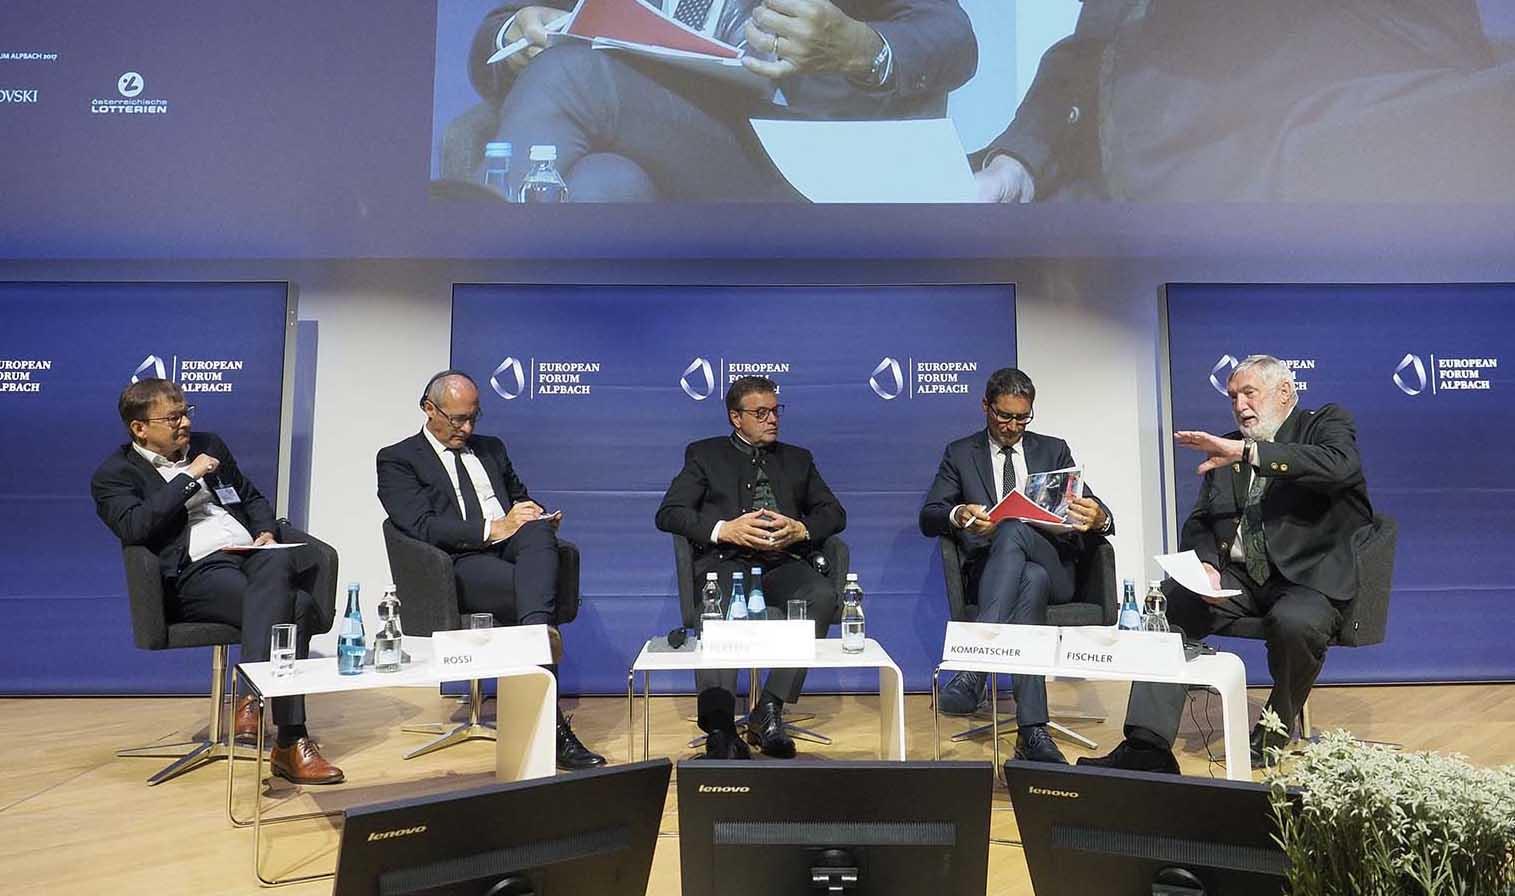 forum alpbach 2017 mobilità sostenibile nellEuregio Helmuth Moroder i presidenti Rossi Platter e Kompatscher Franz Fischler 2